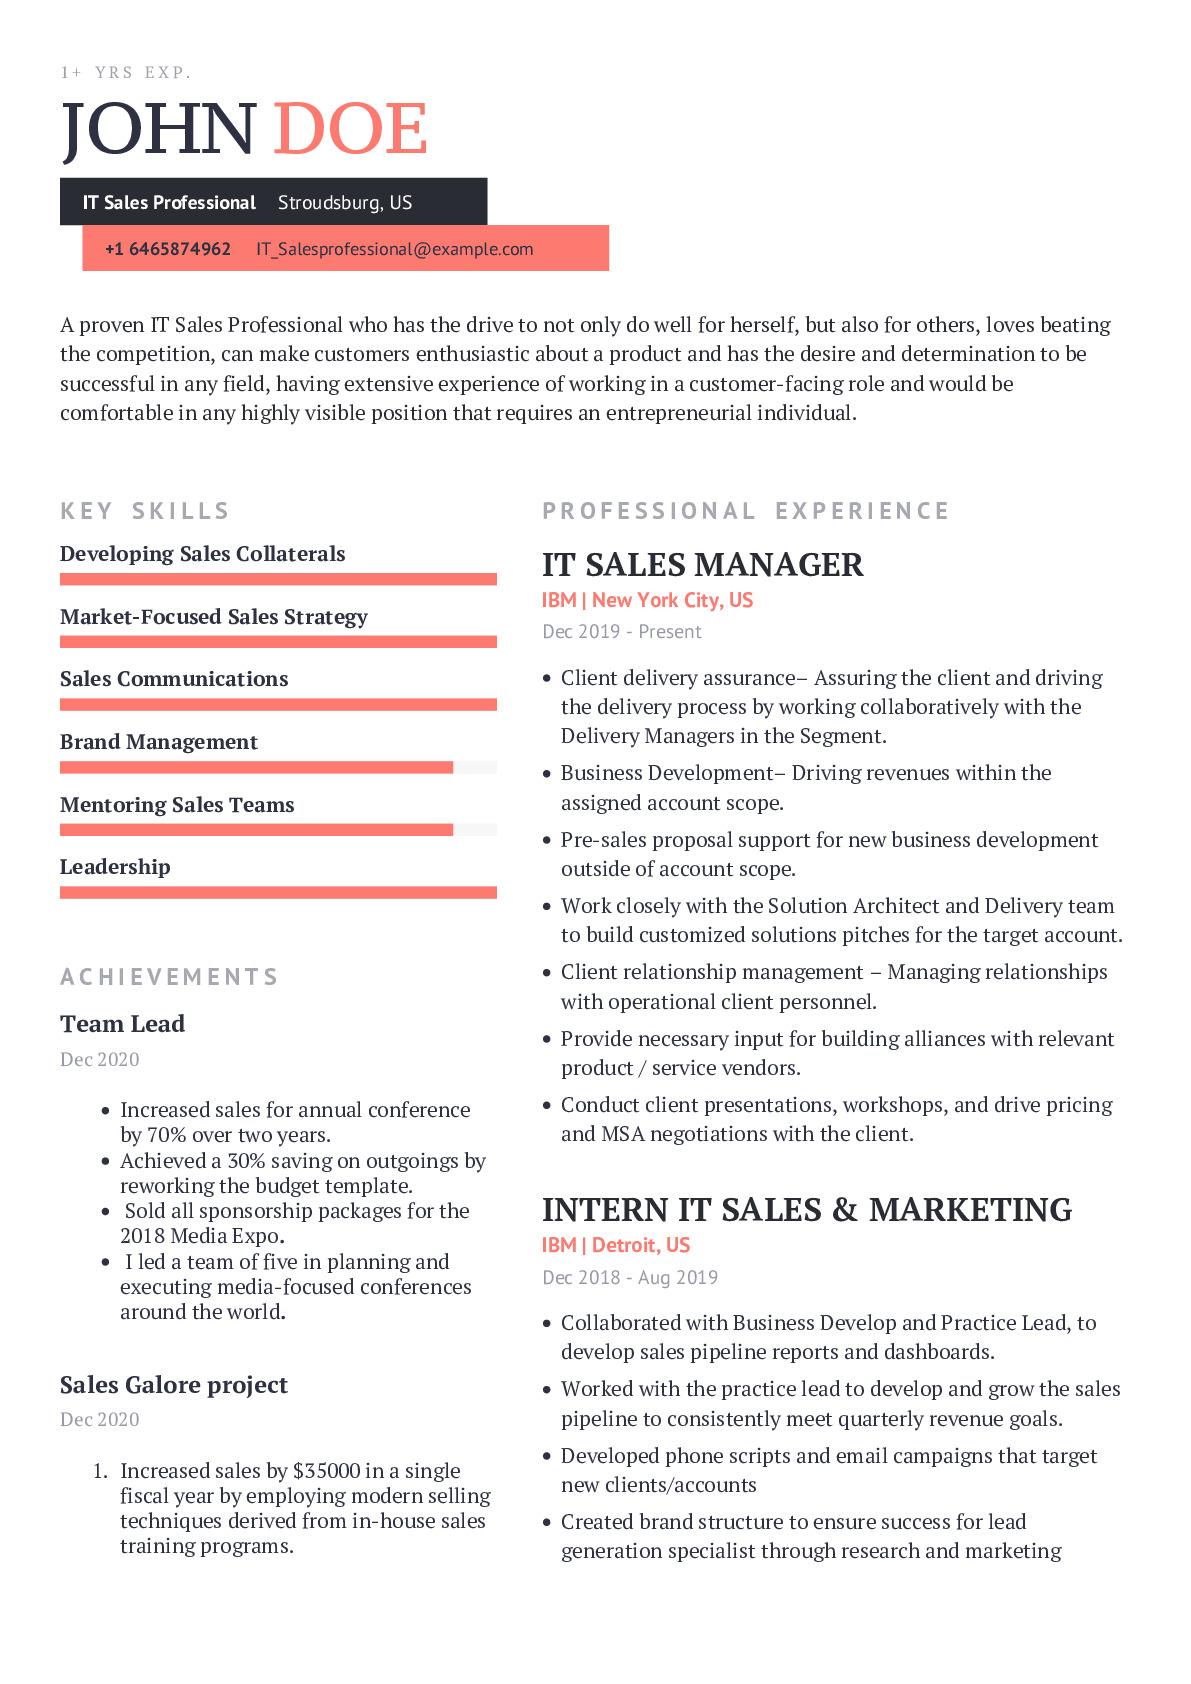 IT Sales Professional Resume Example